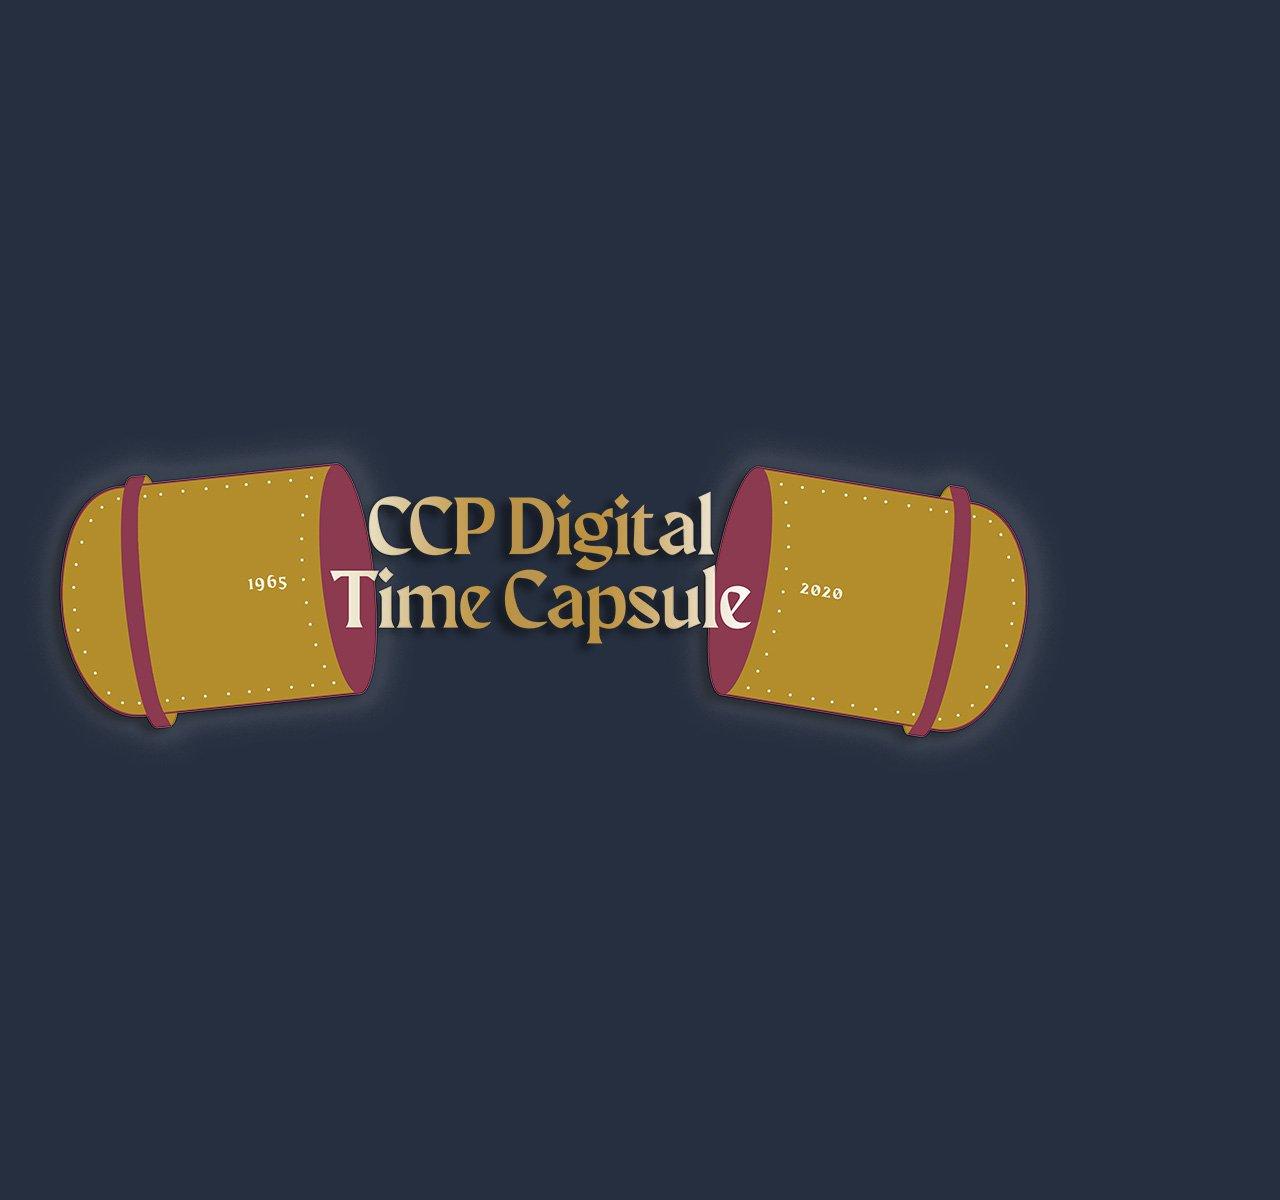 Image does not load (Digital Time Capsule Promo Photo v6)